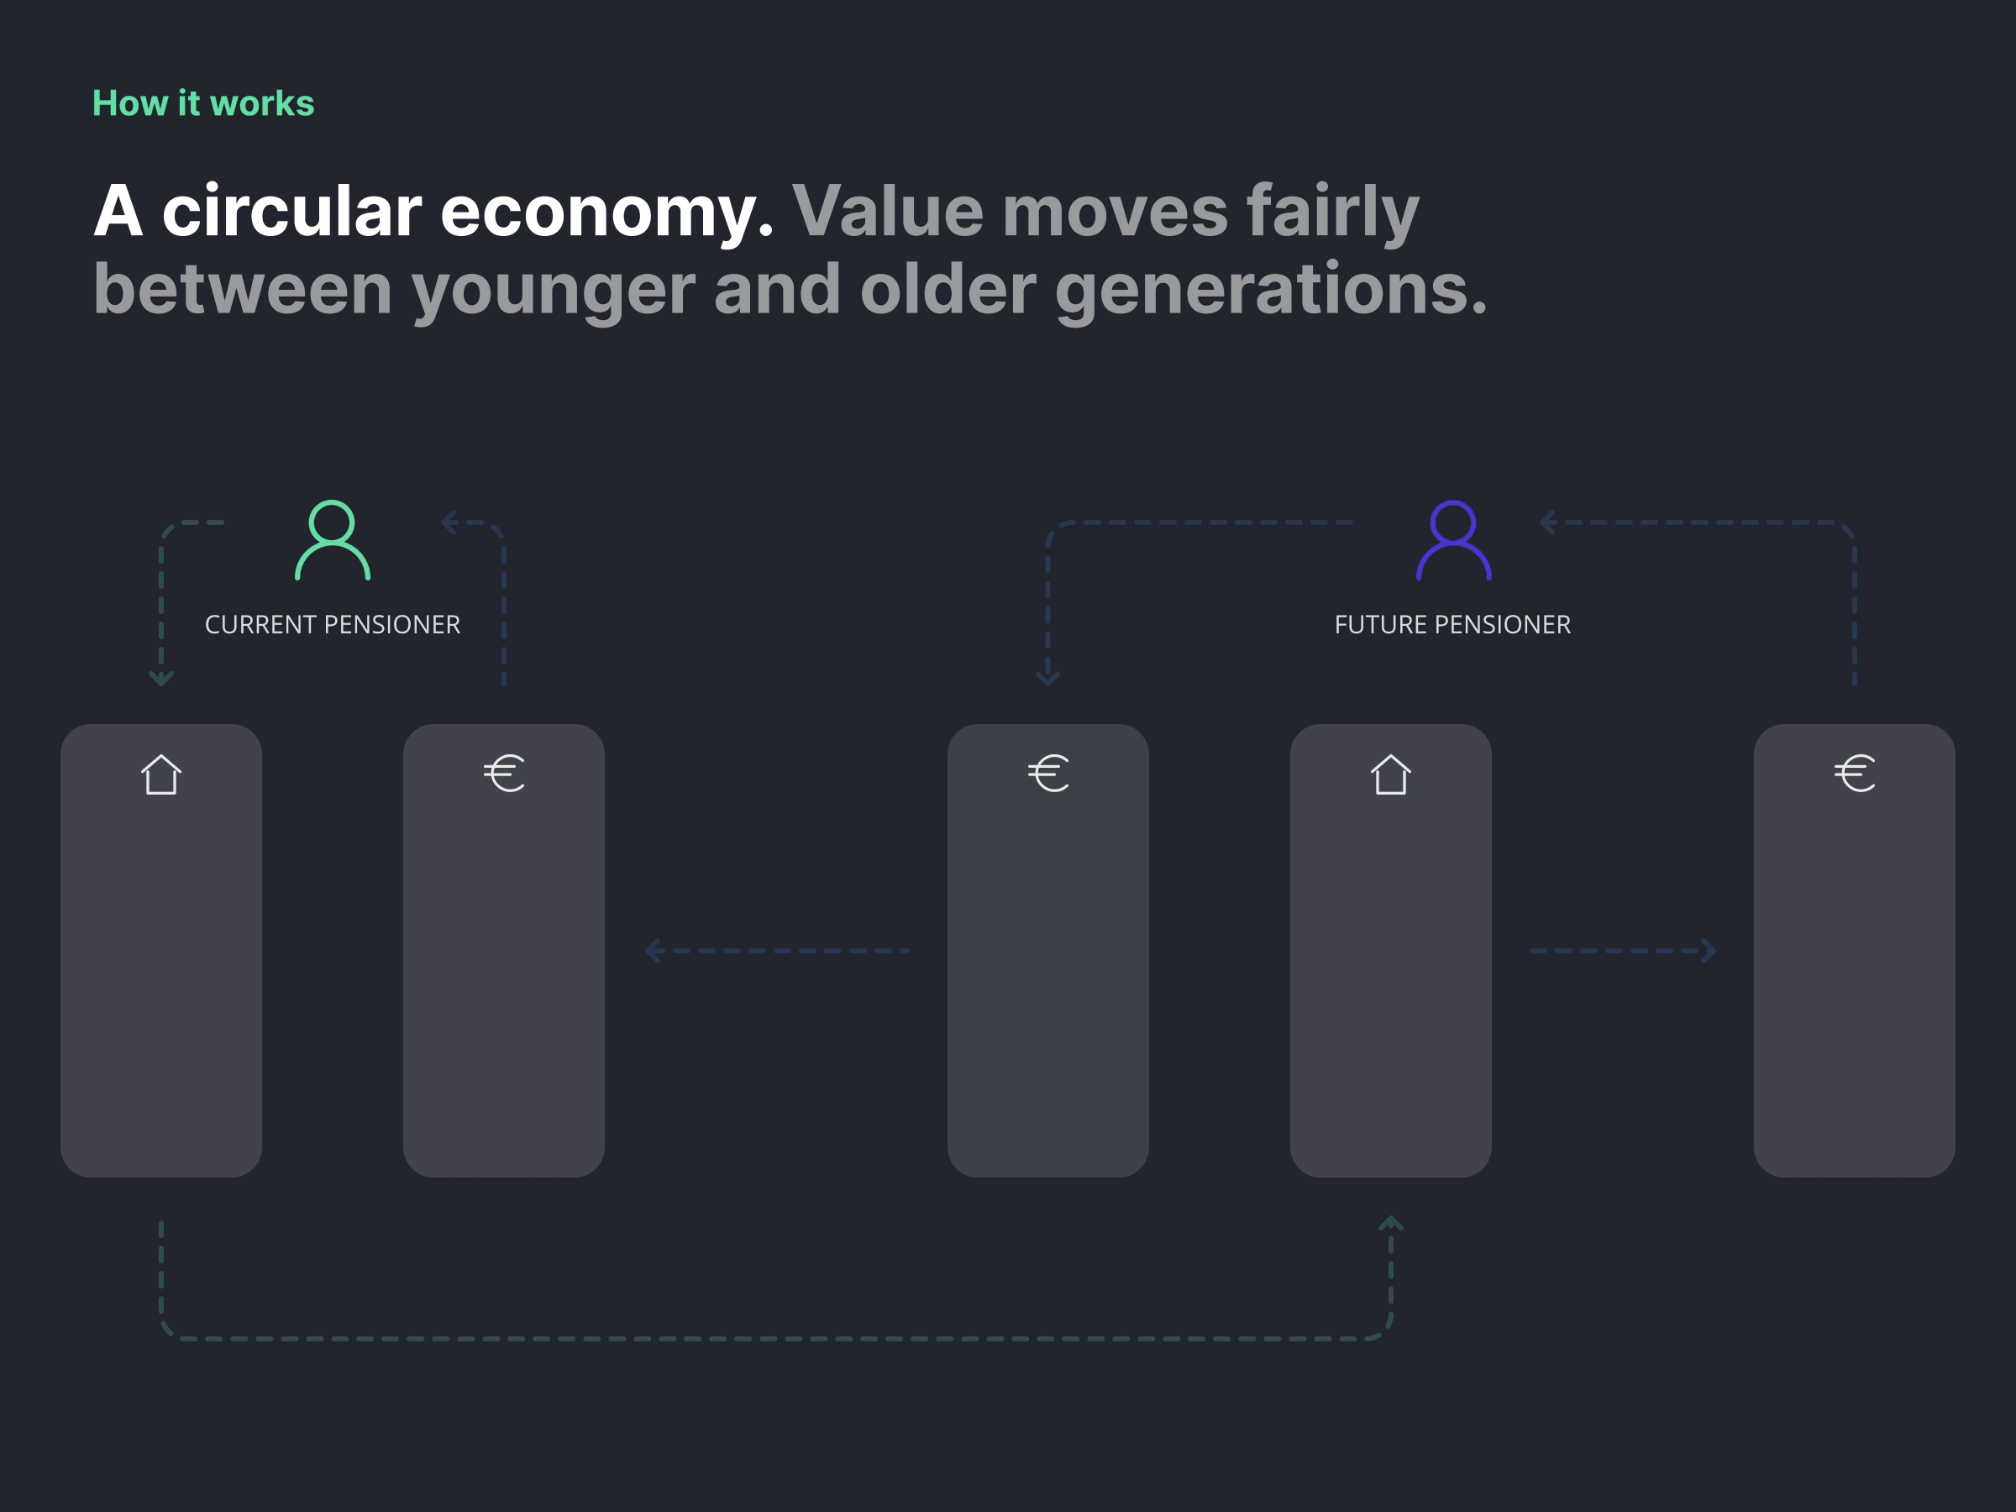 Circular economy animation. How it works